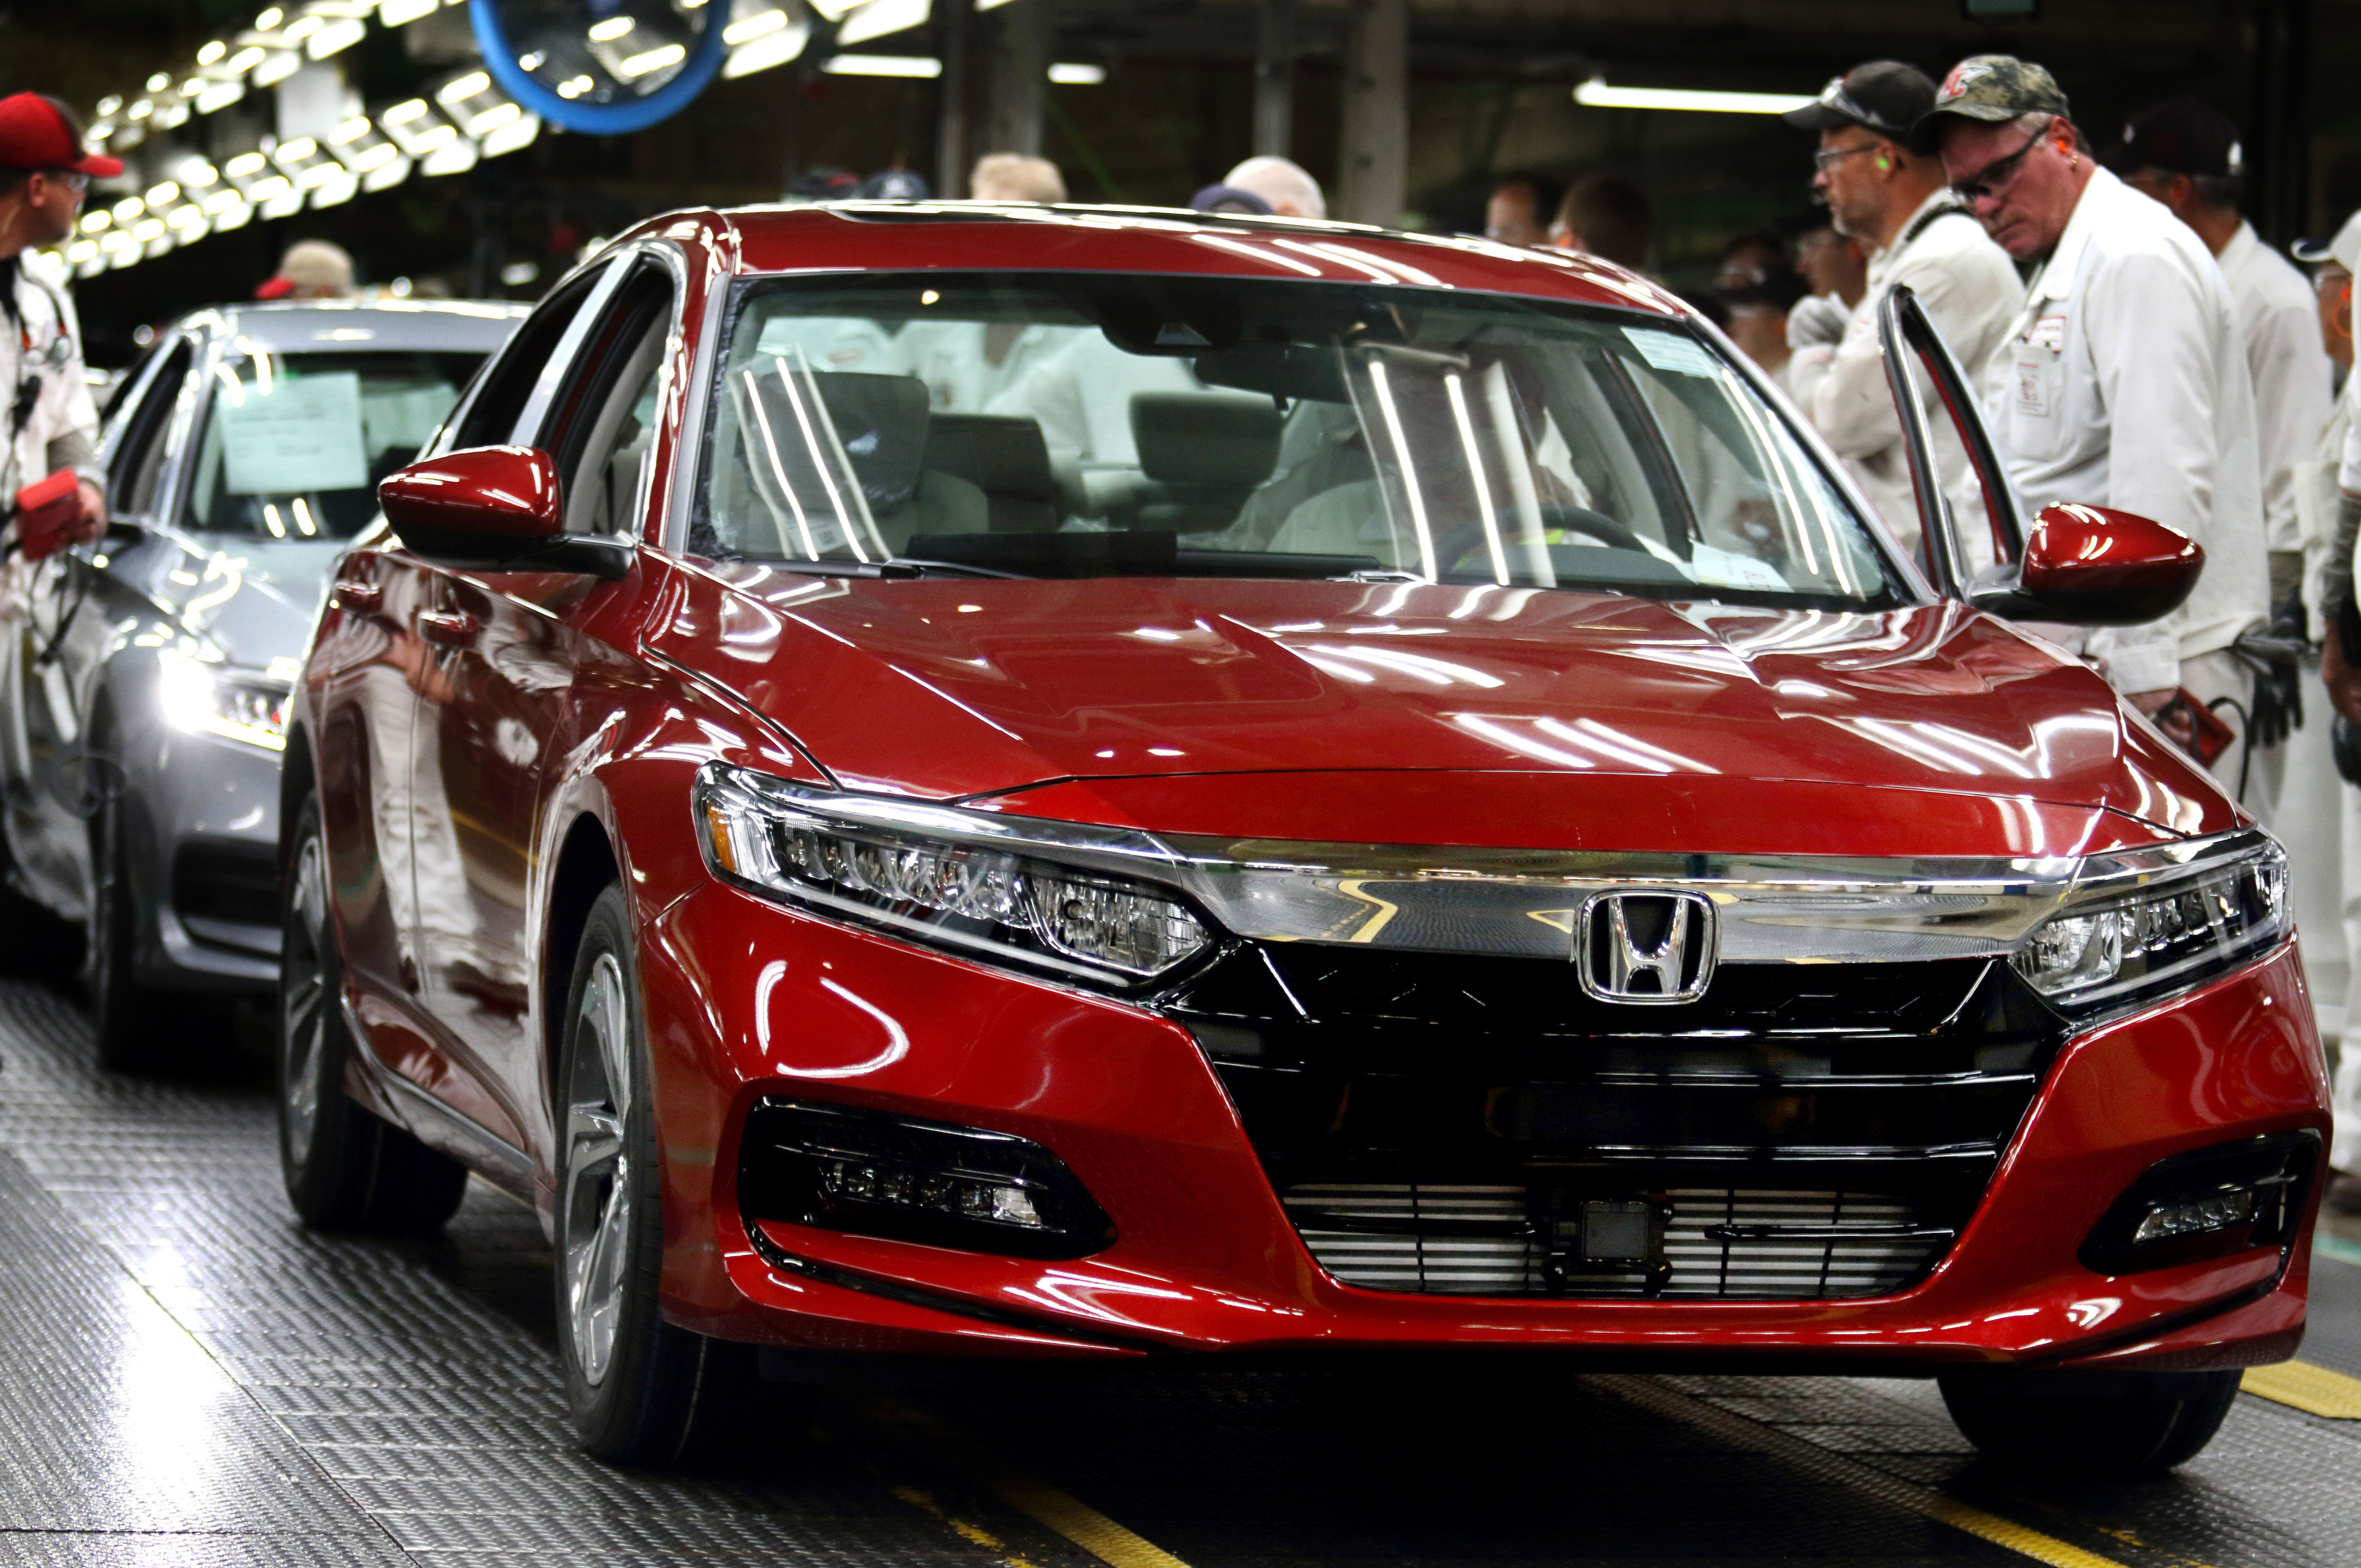 2018 Honda Accord Enters Production In Ohio